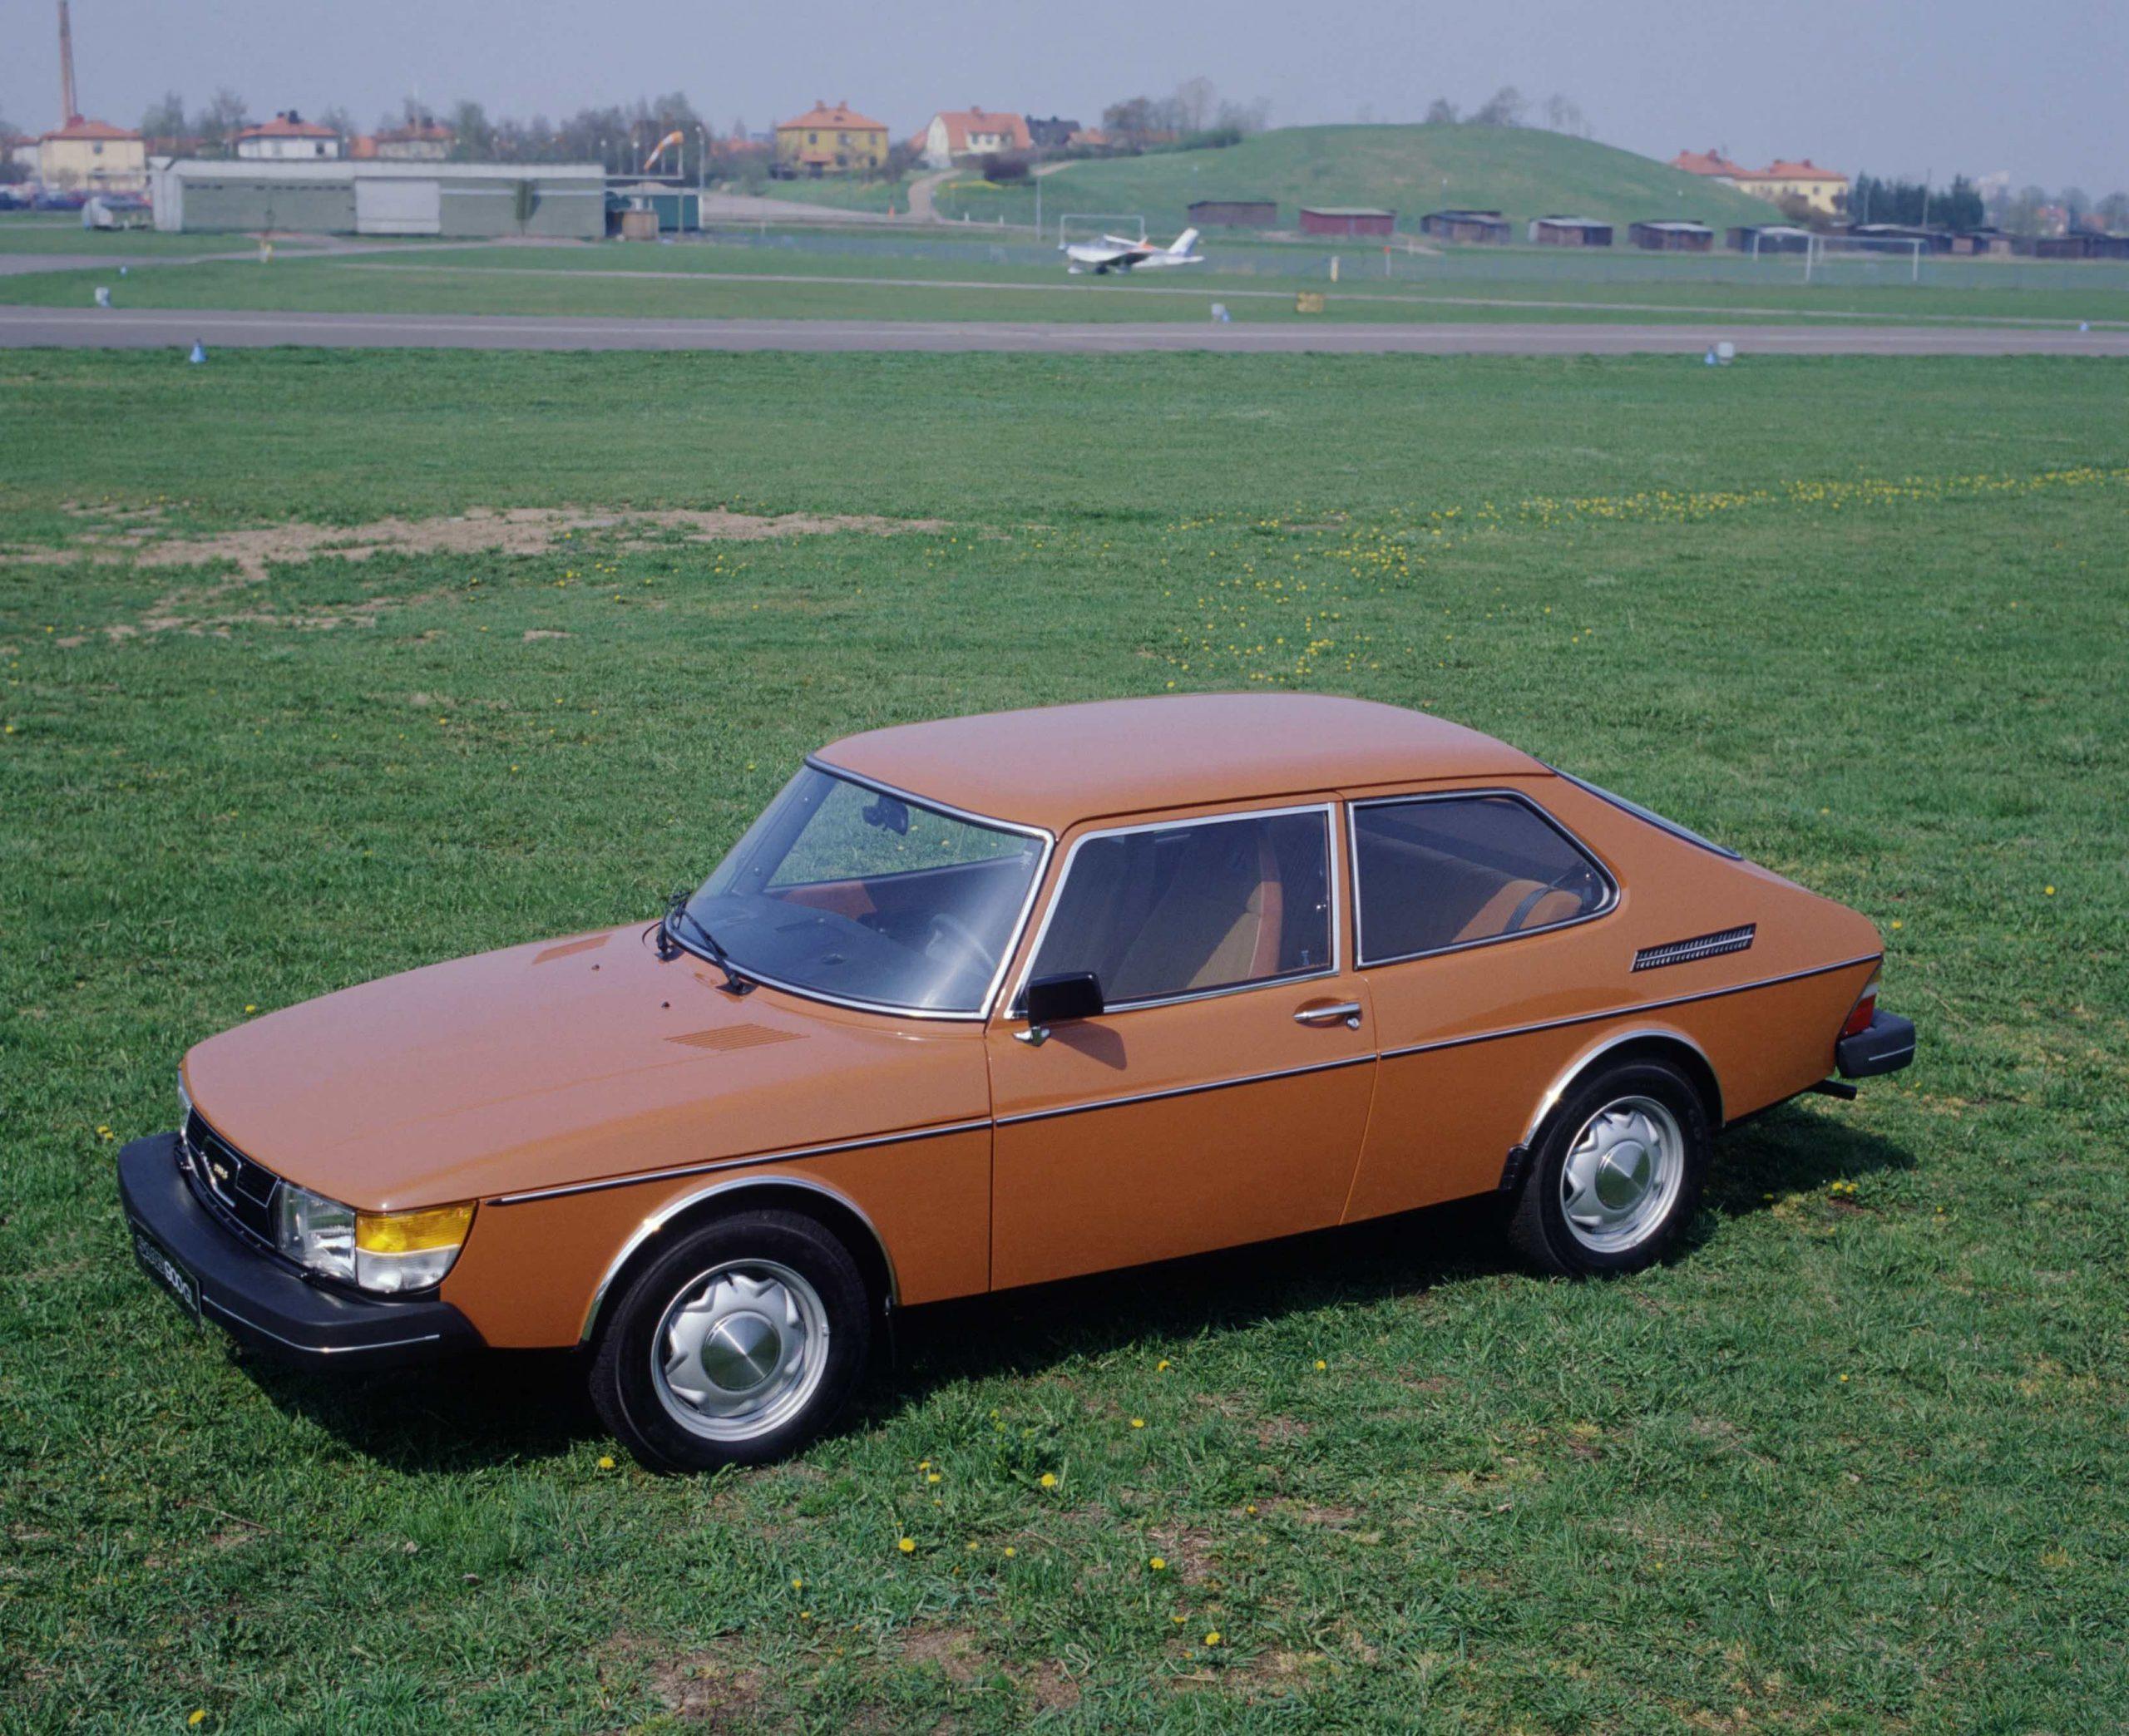 Sierra Alpha Alpha Bravo: the Saab 900 that got away